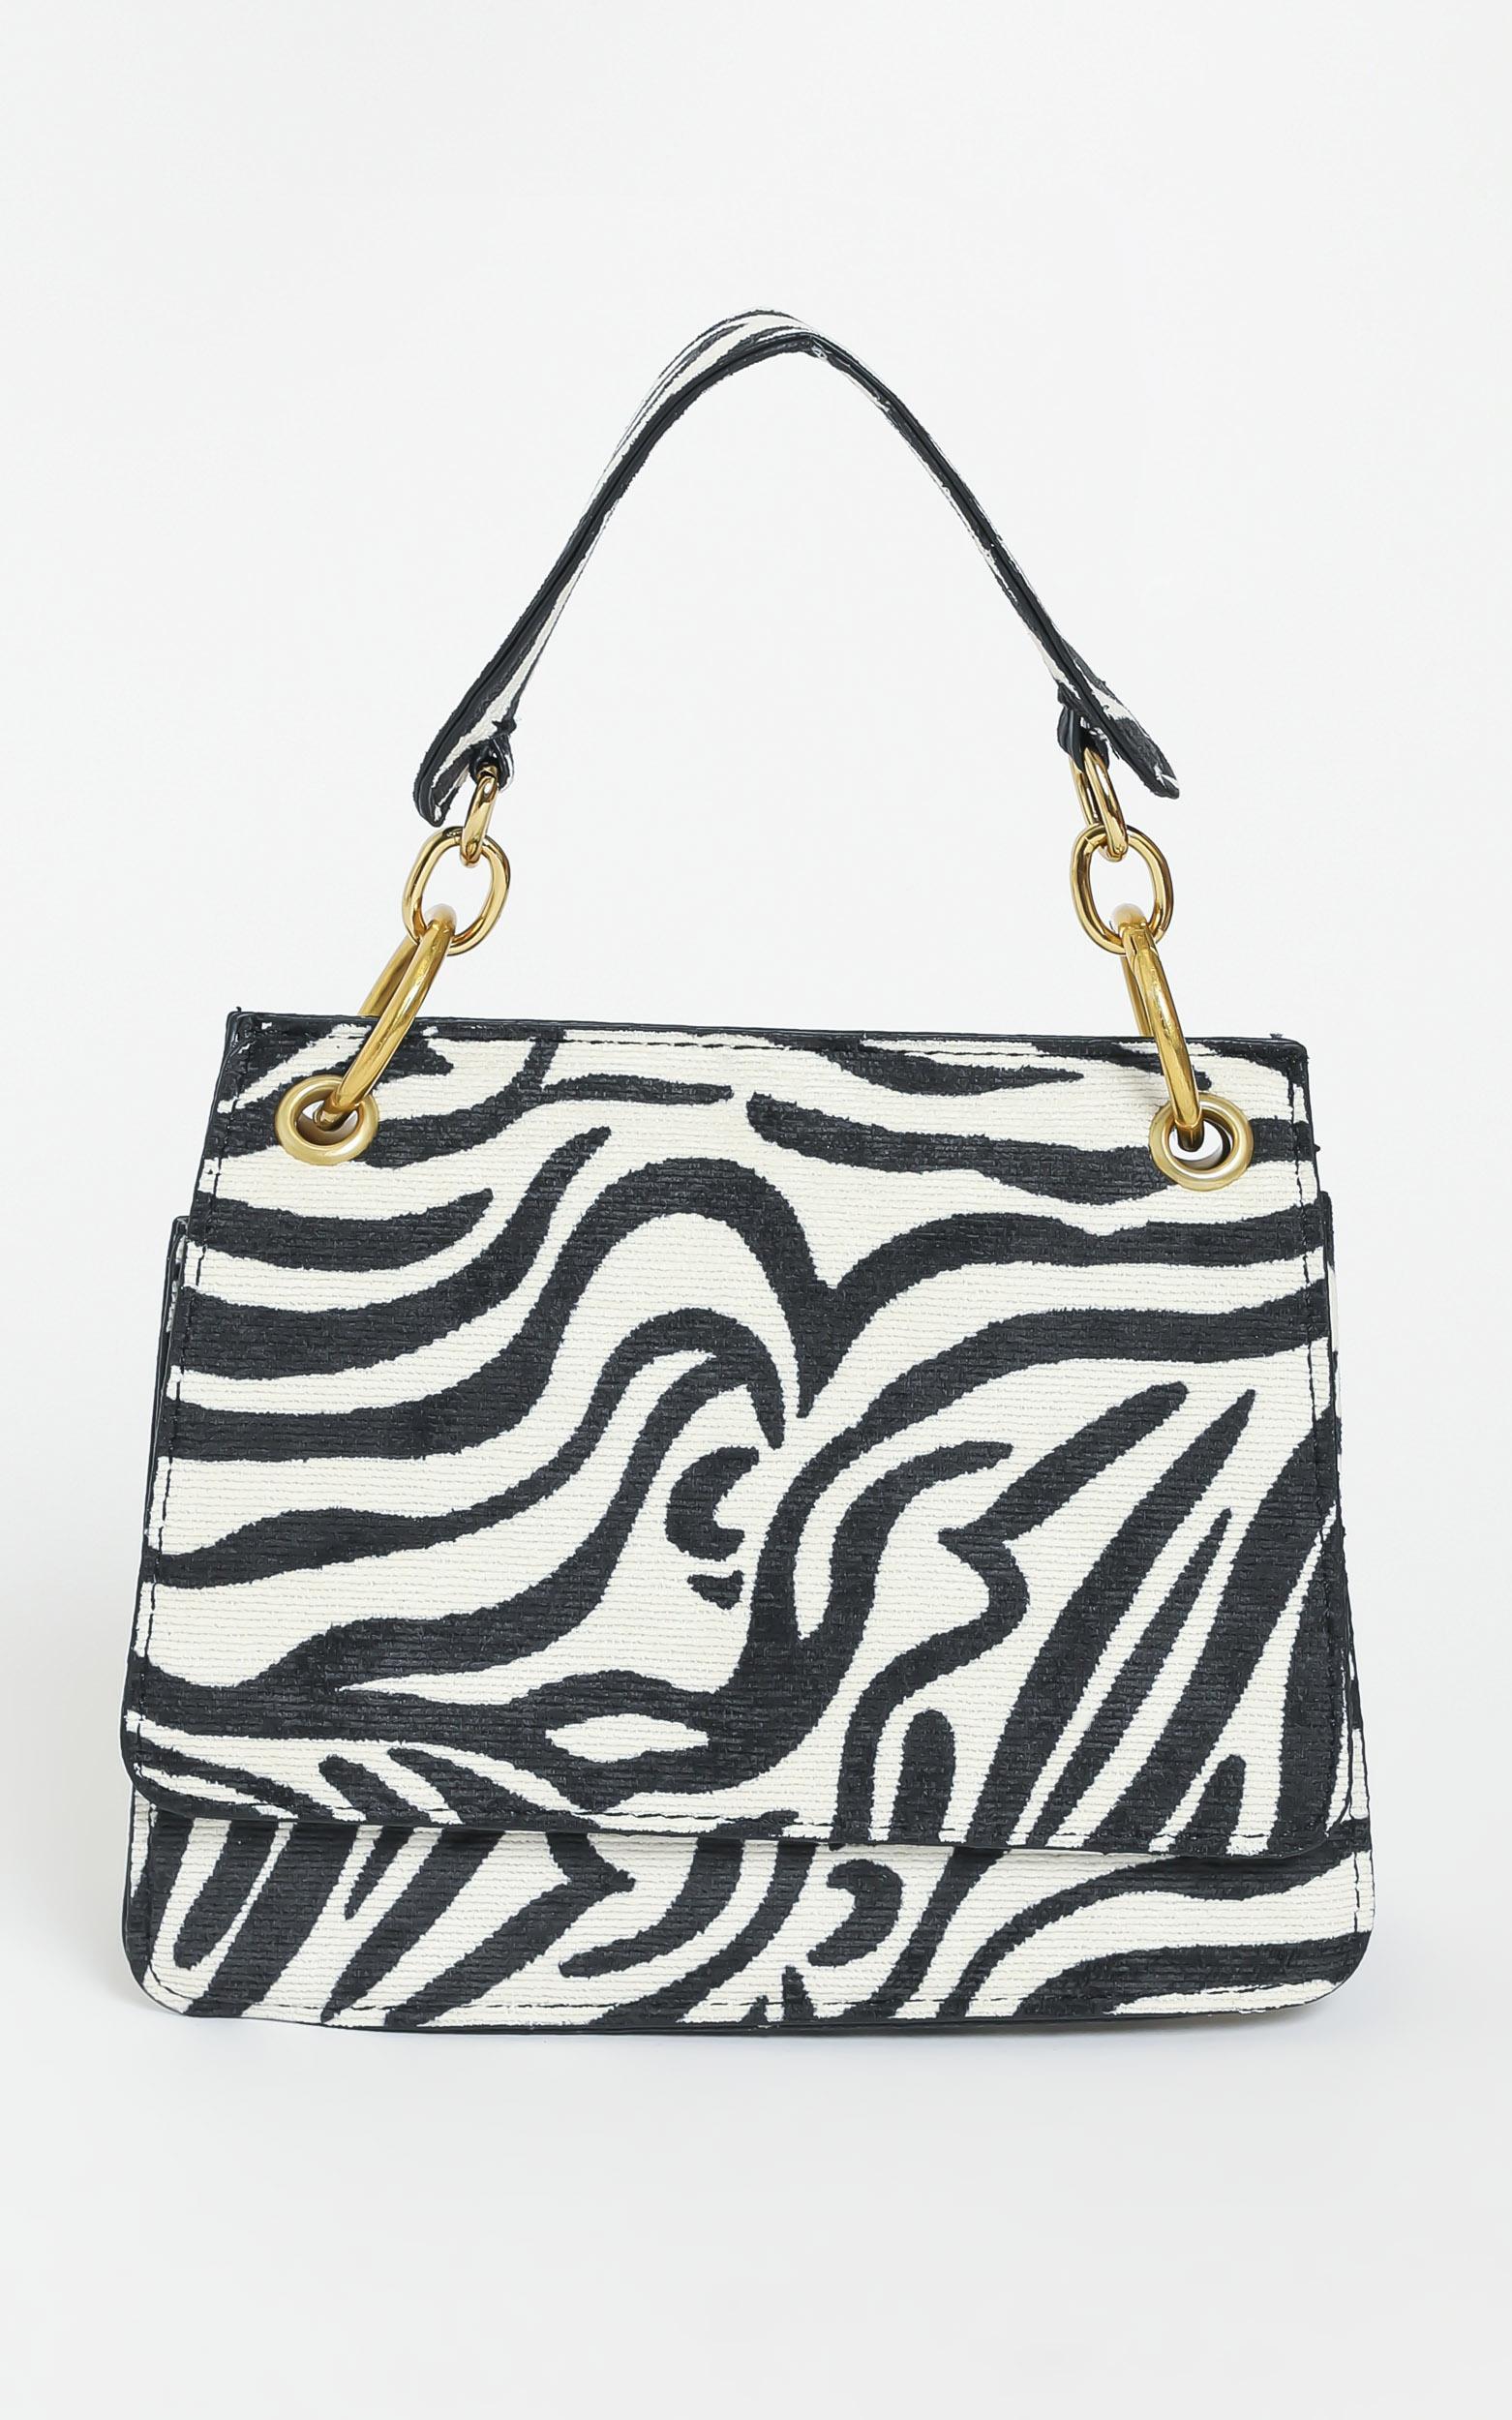 Ryleigh Bag in Zebra Print, , hi-res image number null